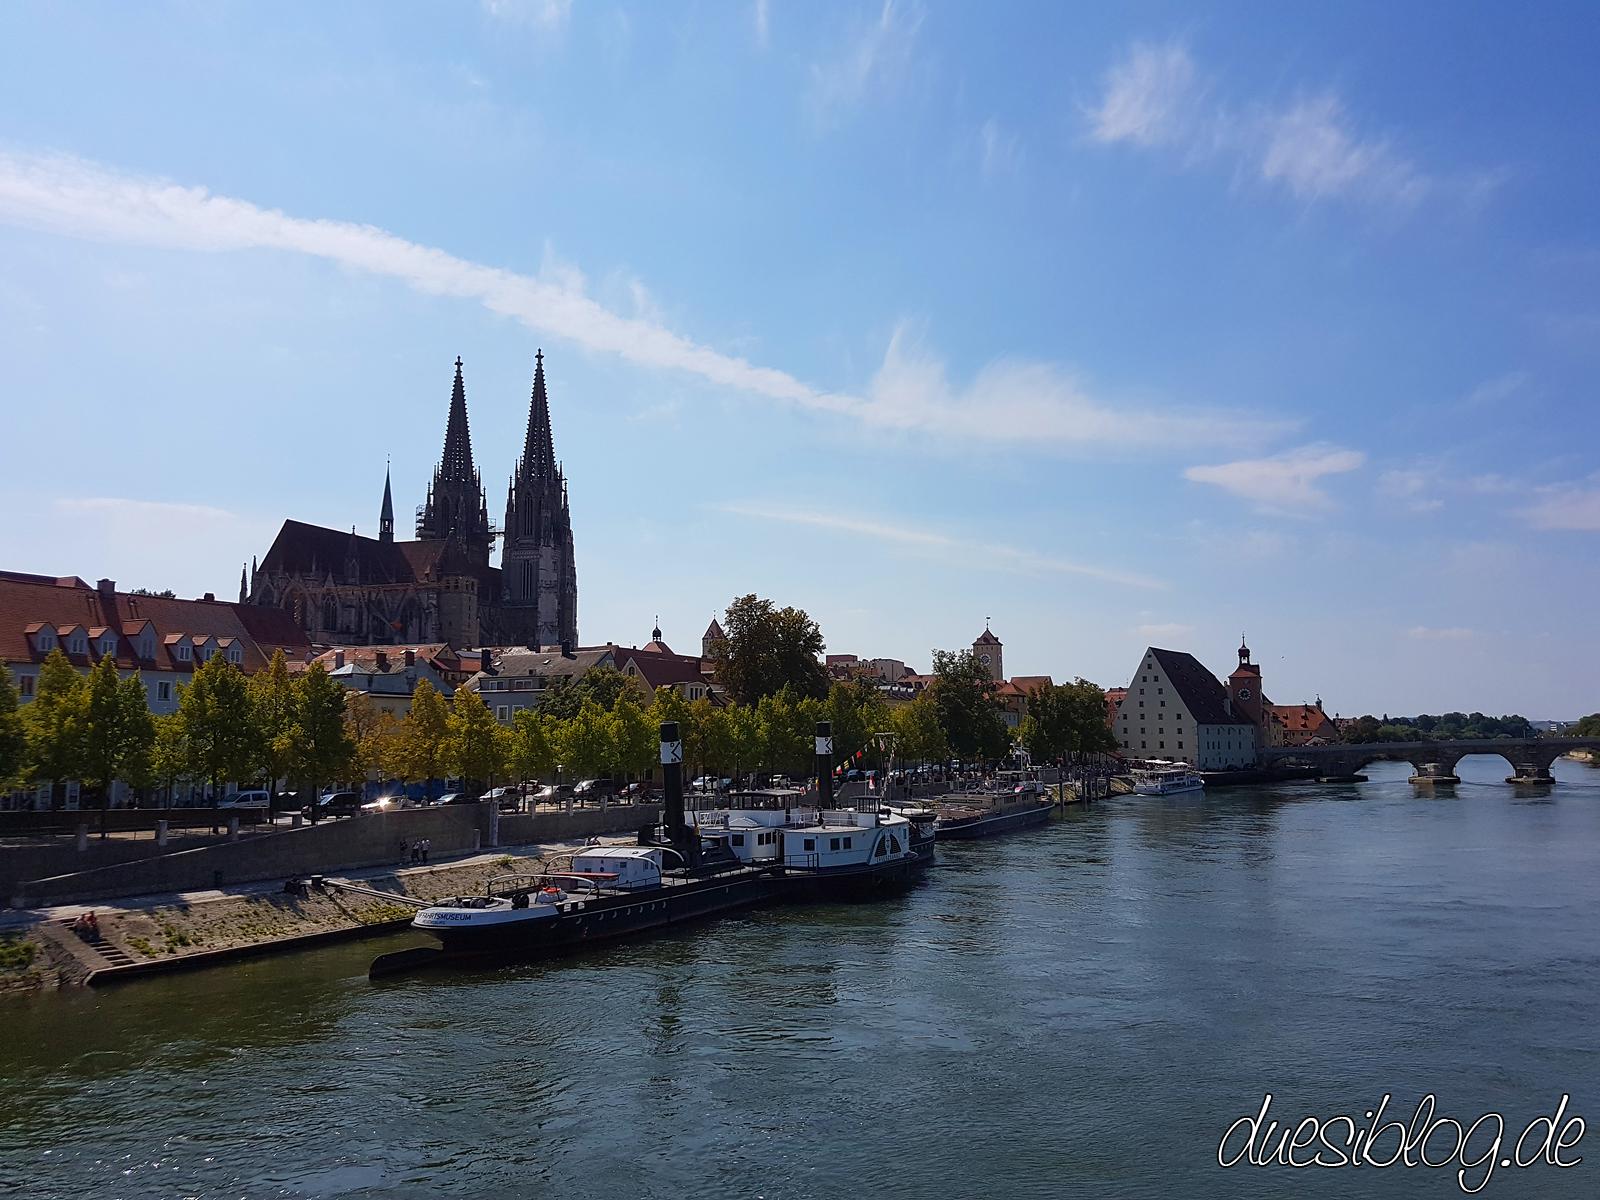 Regensburg Steinerne Brücke Donauufer Travelblog duesiblog 15